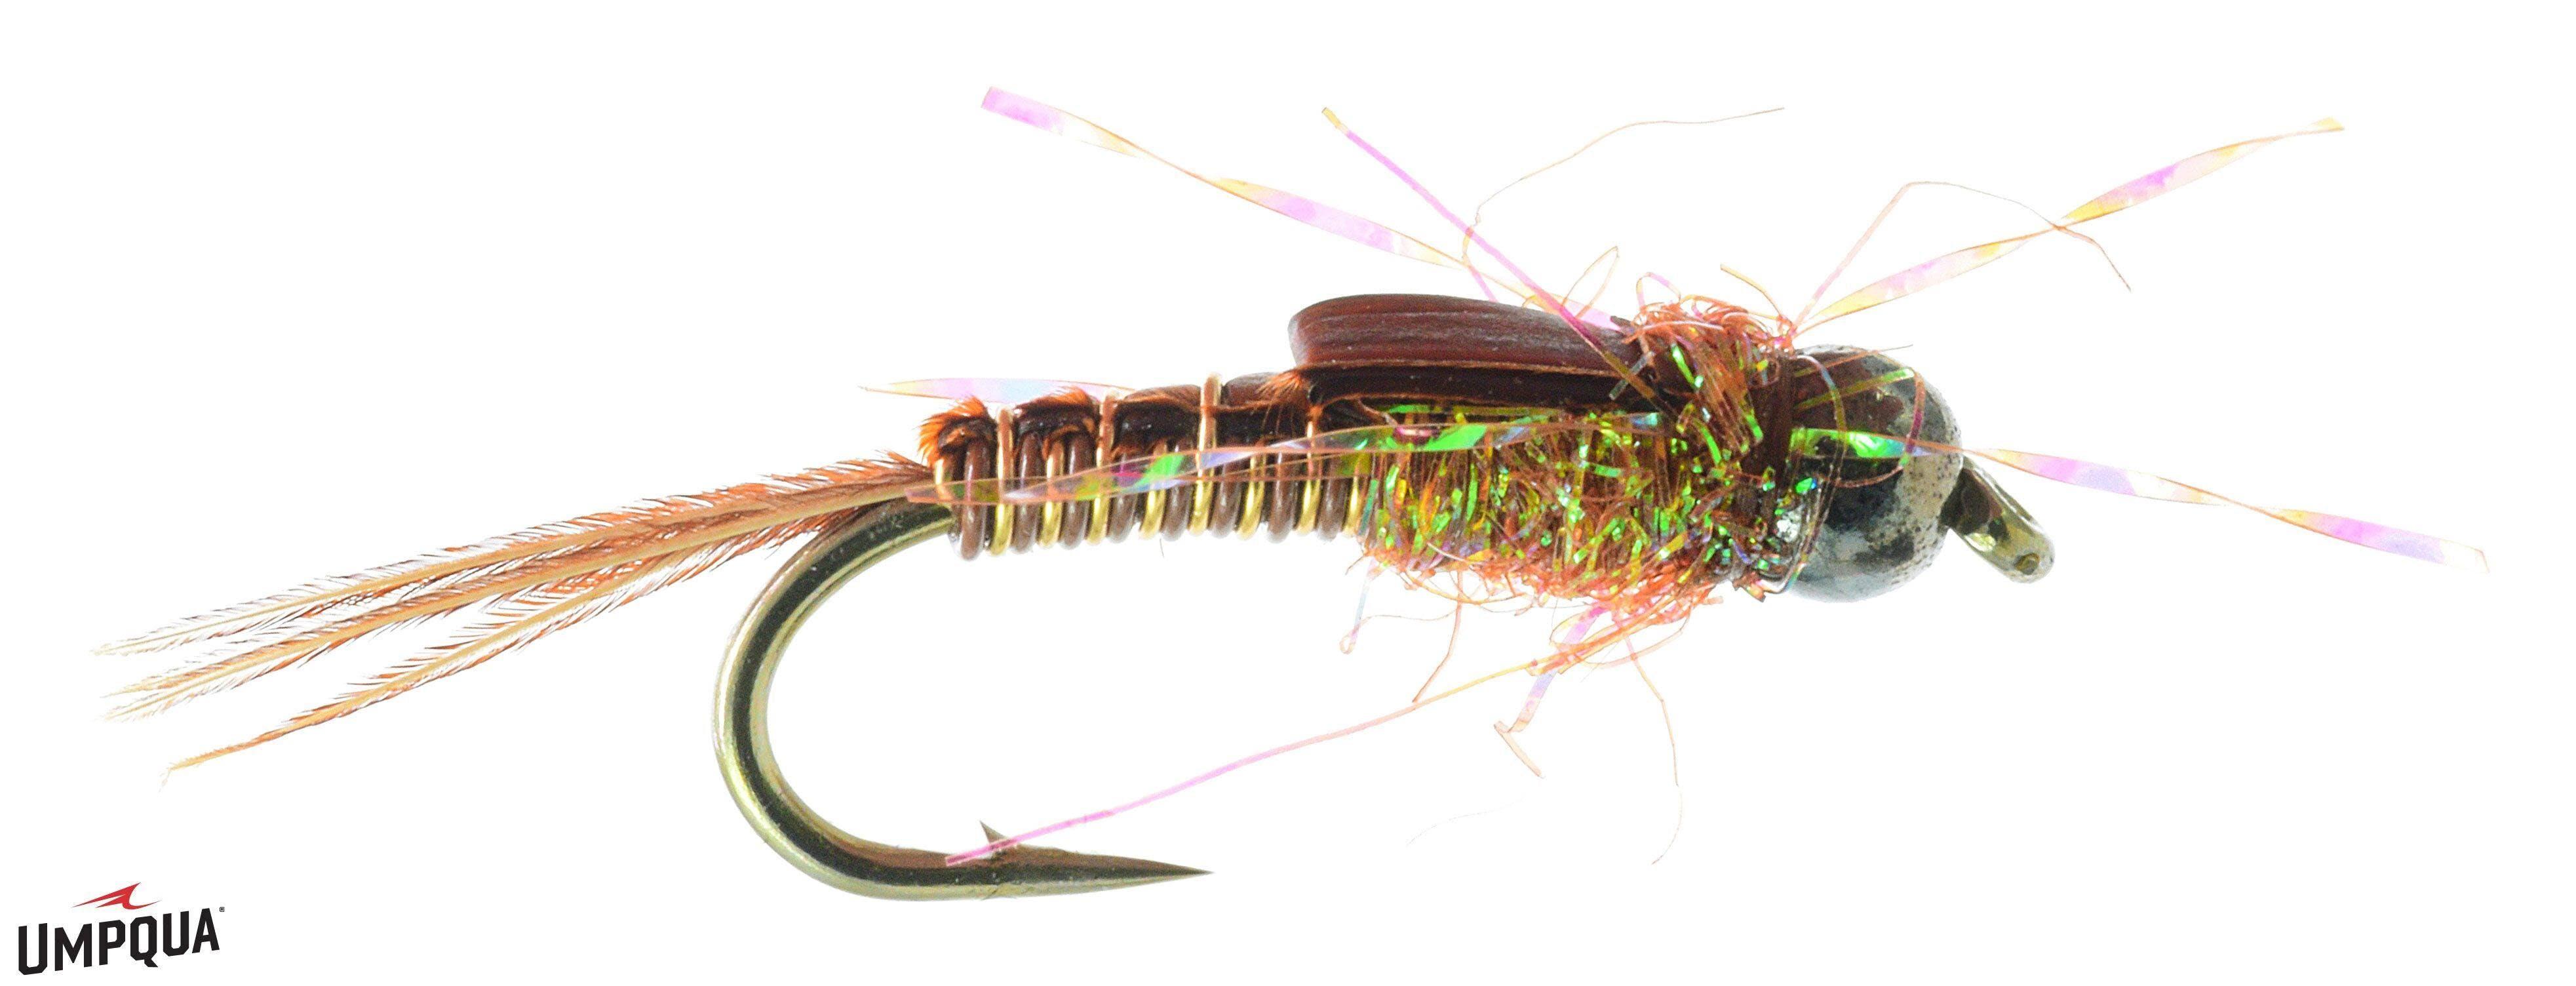 Umpqua Pickpocket Morrish, Golden Brown / 12